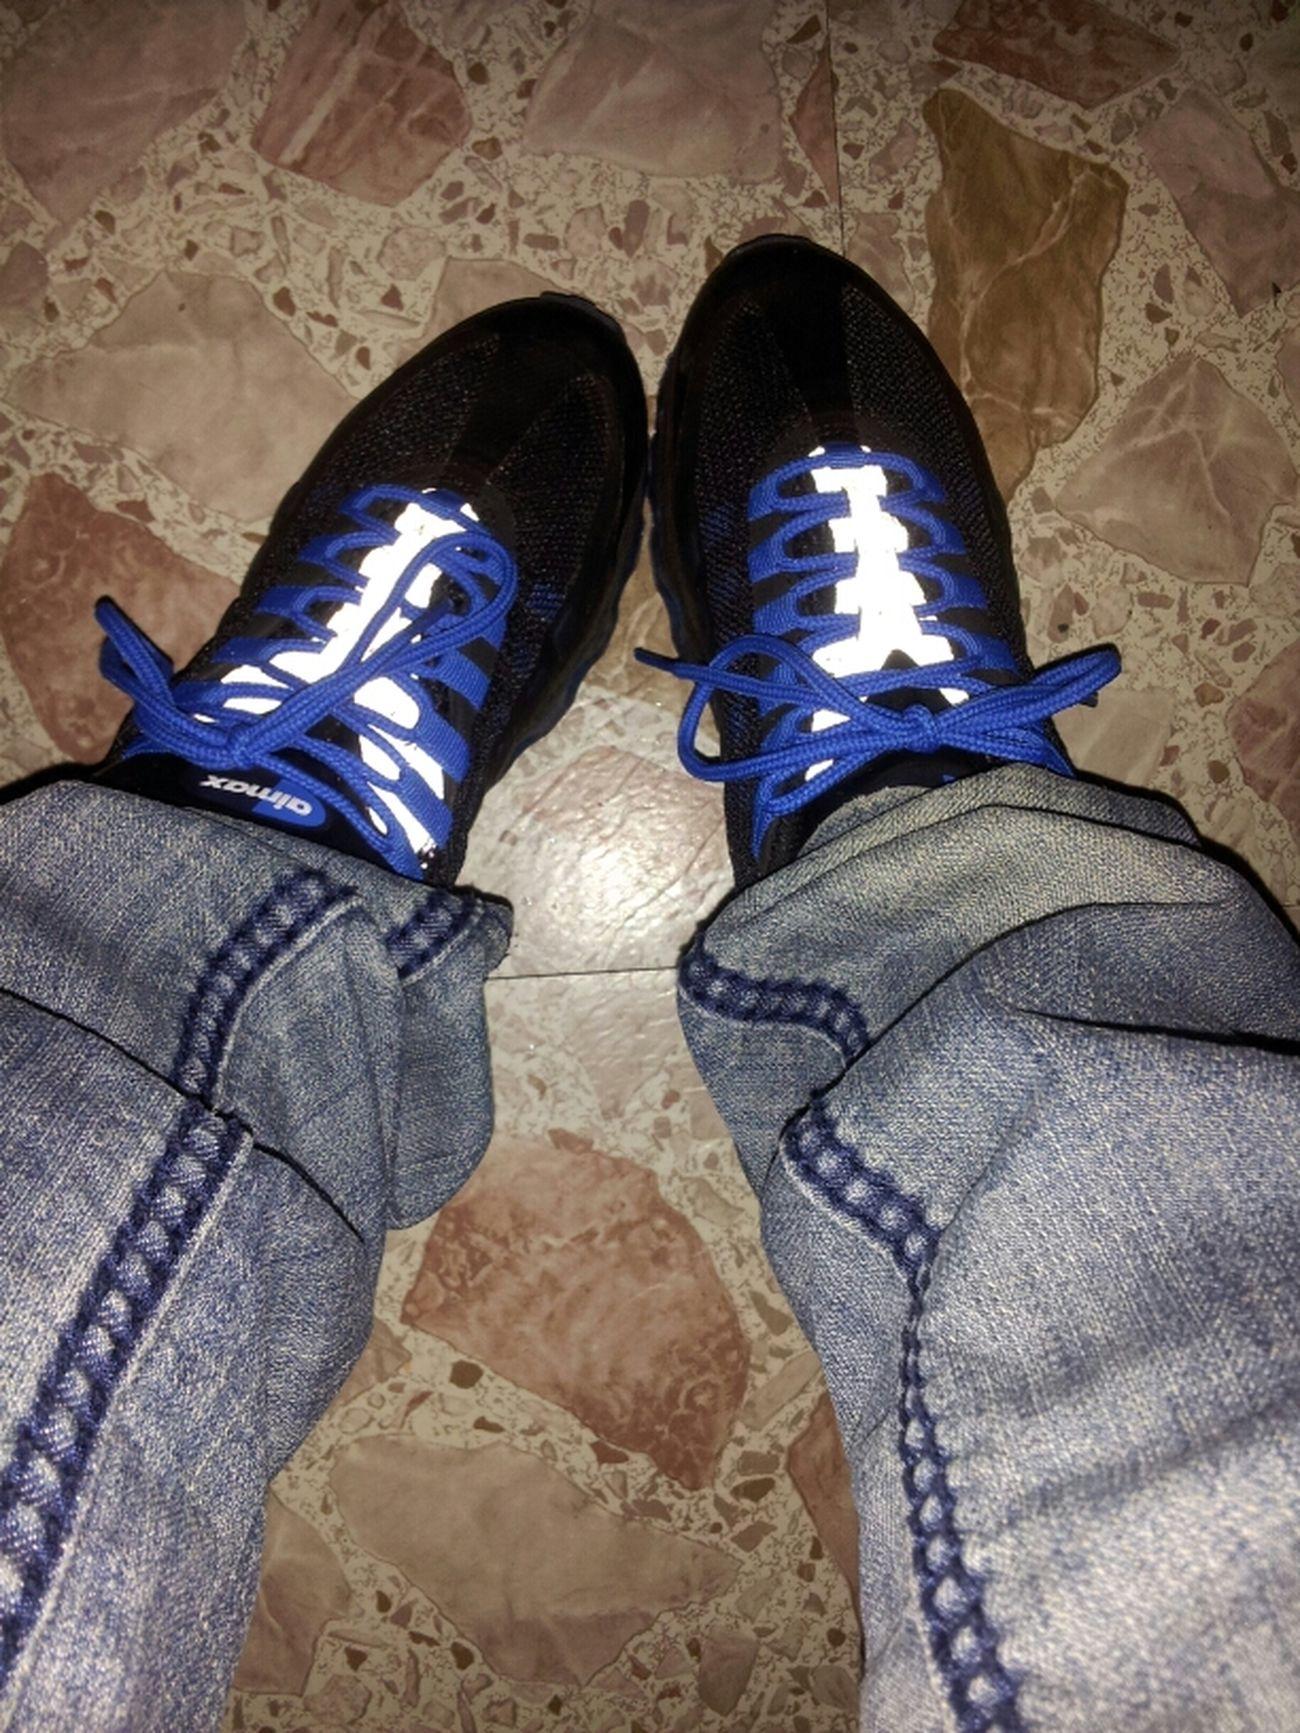 Kicks Of The Dayyy